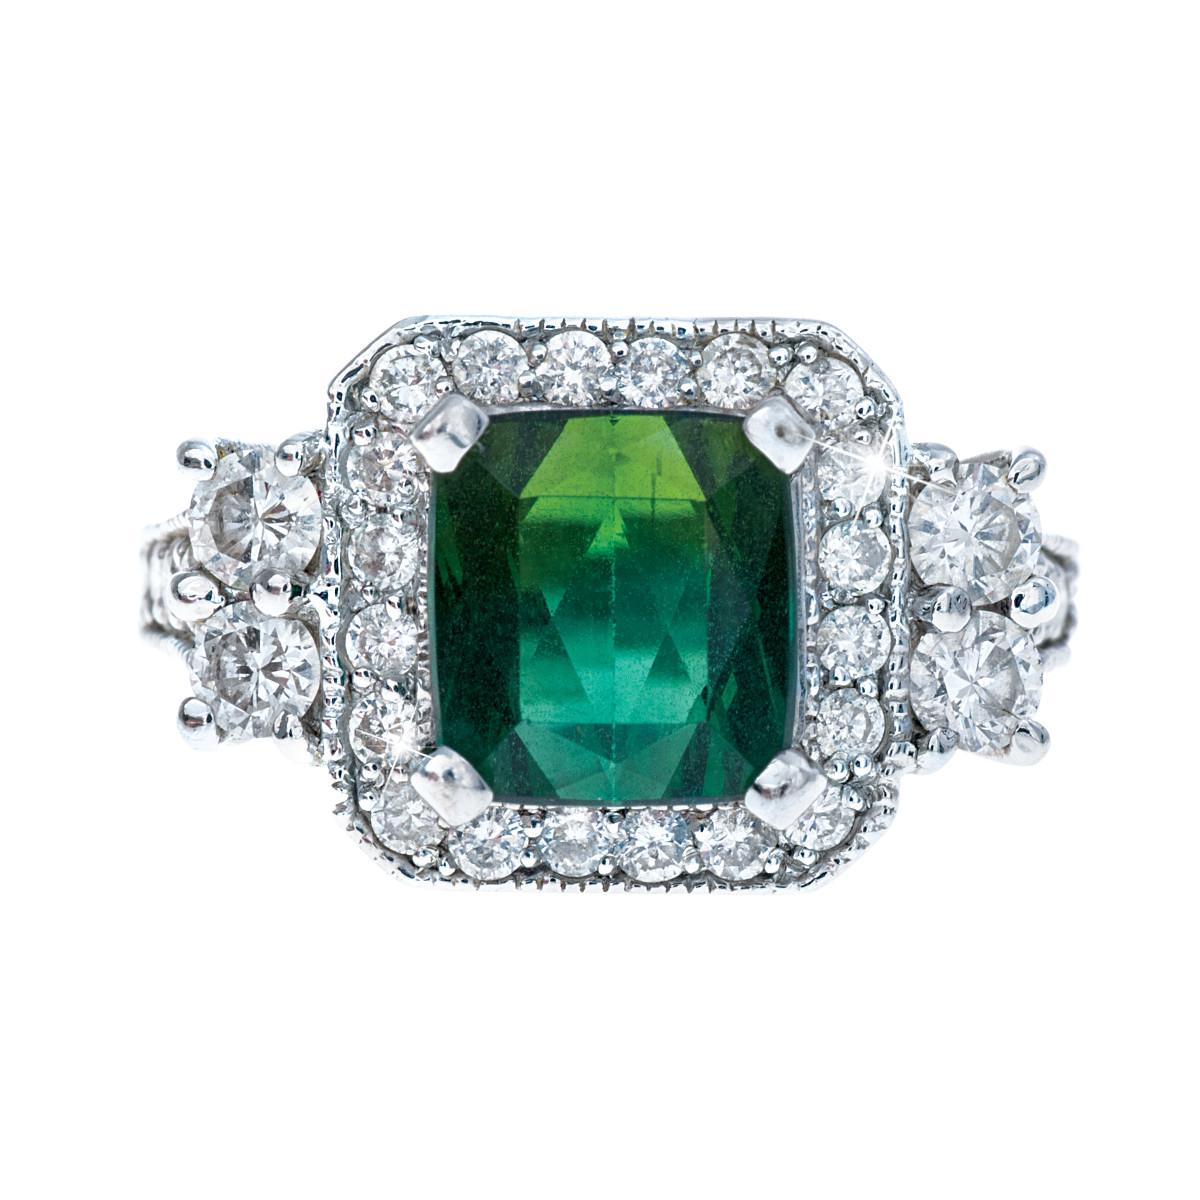 Vintage 3.17 CTW Green Tourmaline & Diamond Ring